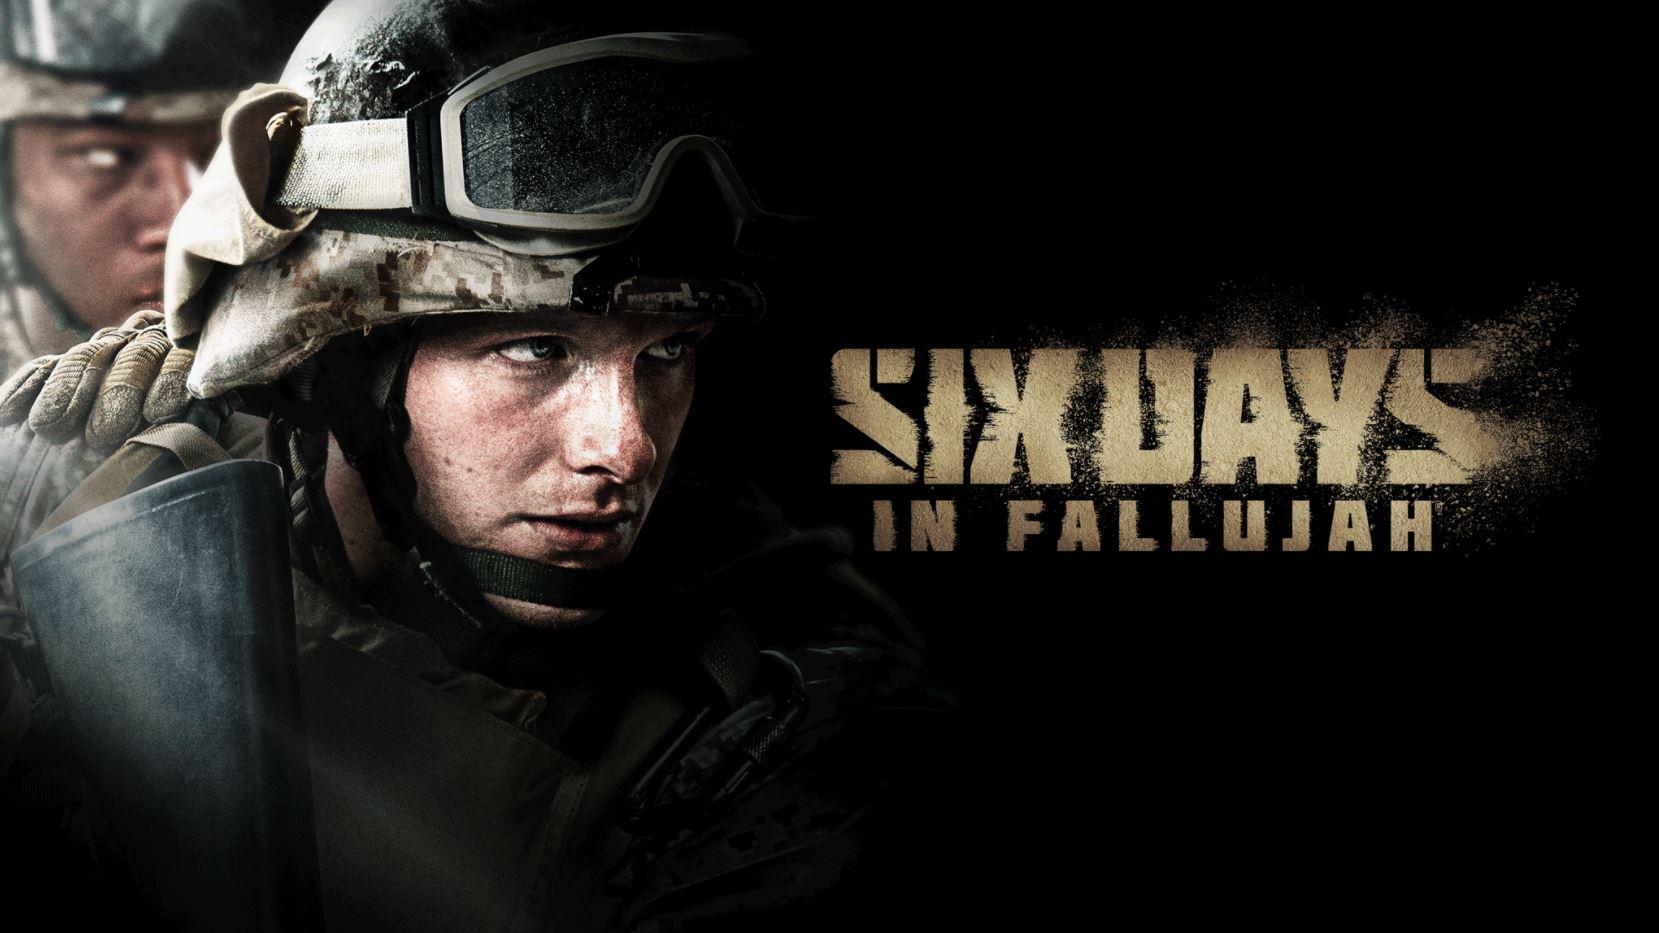 six-days-in-fallujah-news-reviews-videos